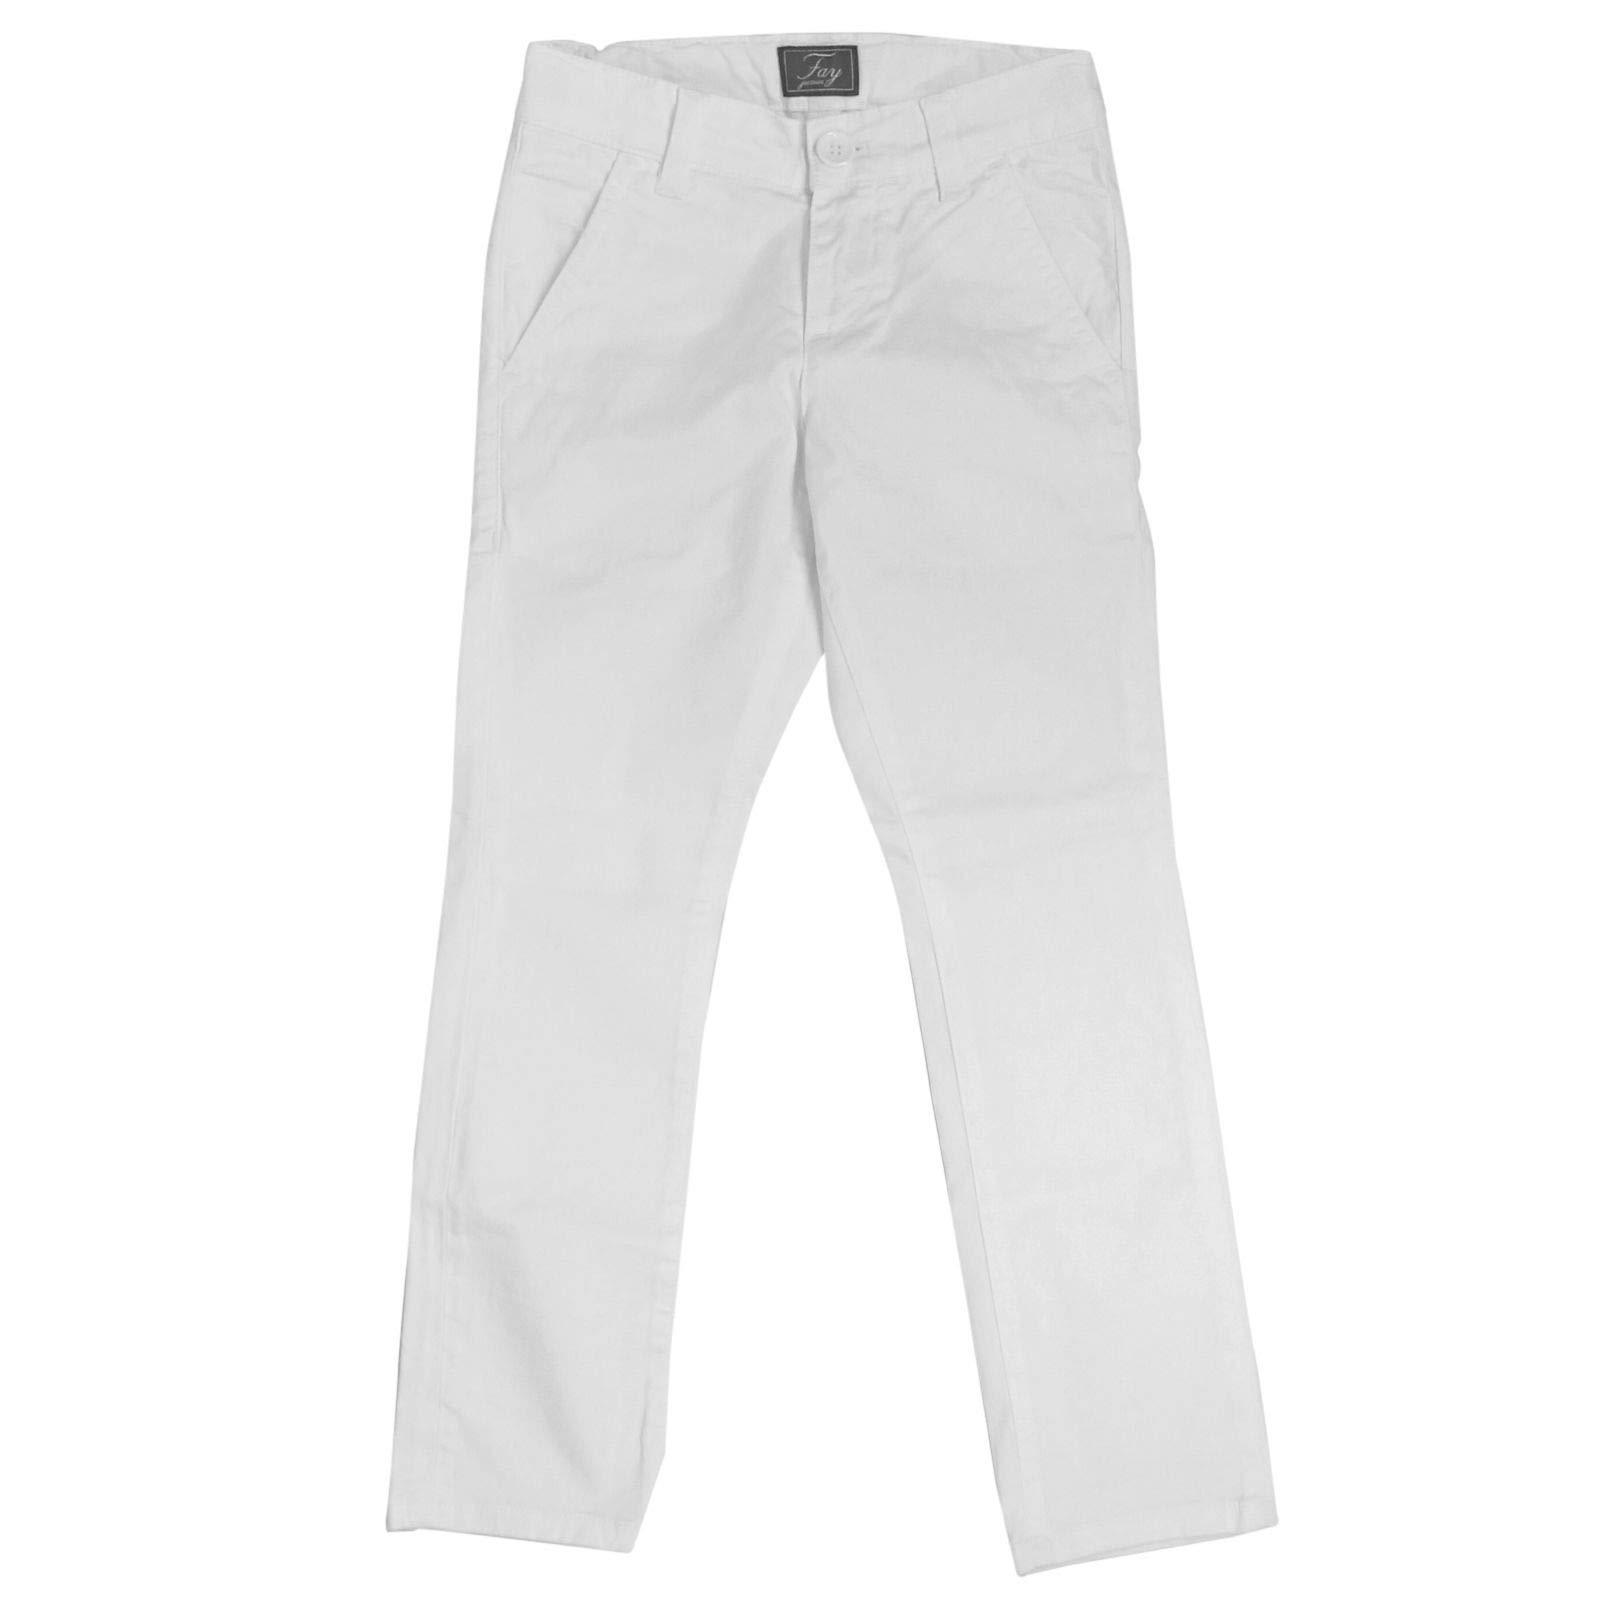 fay Boys Nui8038732tqpsb001 White Cotton Pants